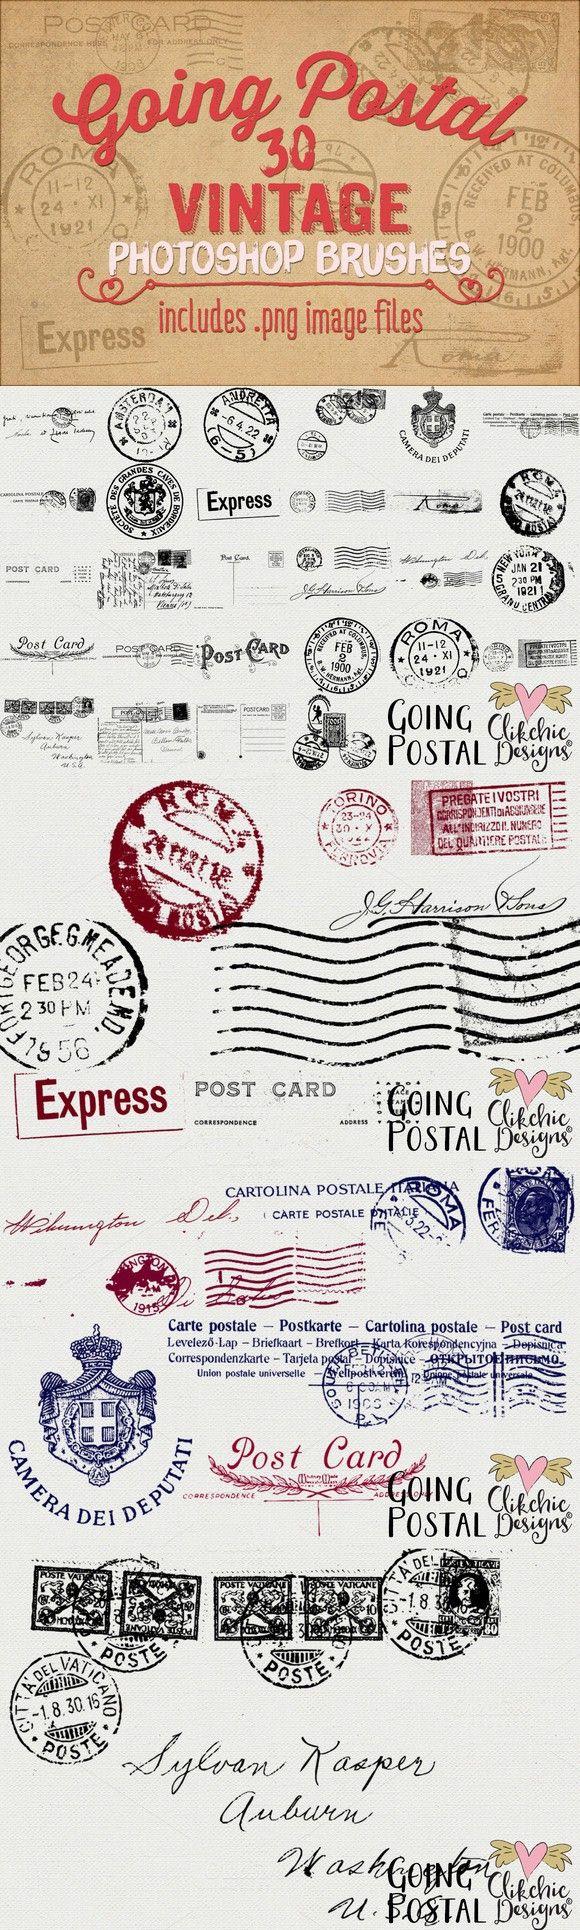 Going Postal Vintage PS Brushes. Photoshop Brushes. $9.00